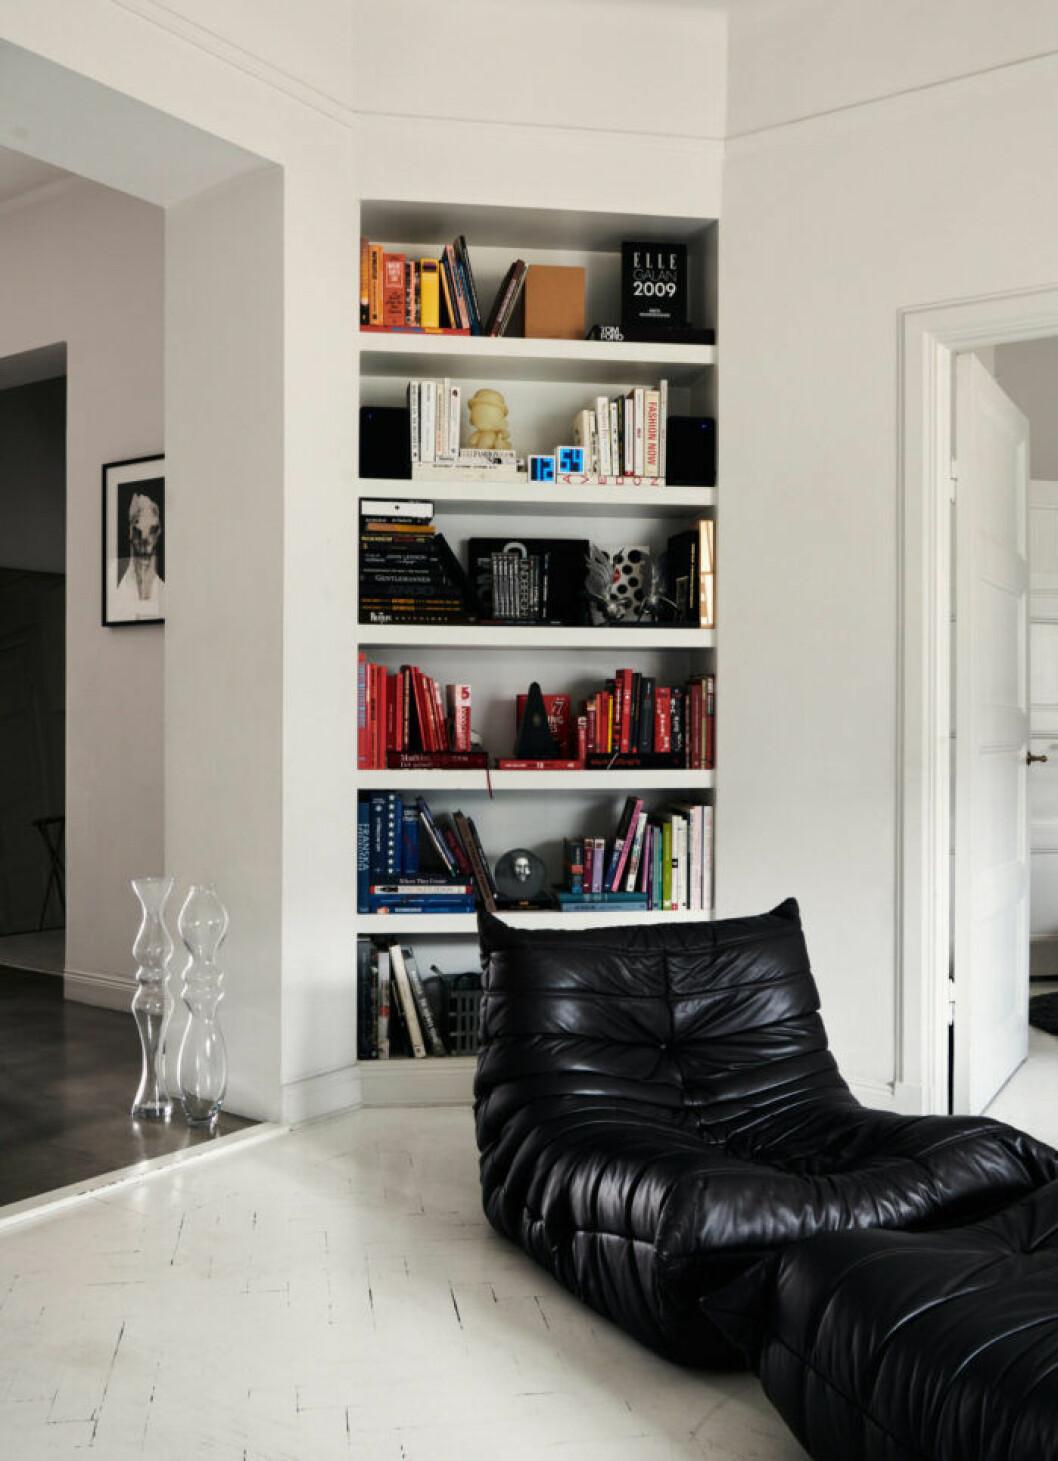 Platsbyggd bokhylla hos modedesignern Lee Cotter i lägenheten i Stockholm